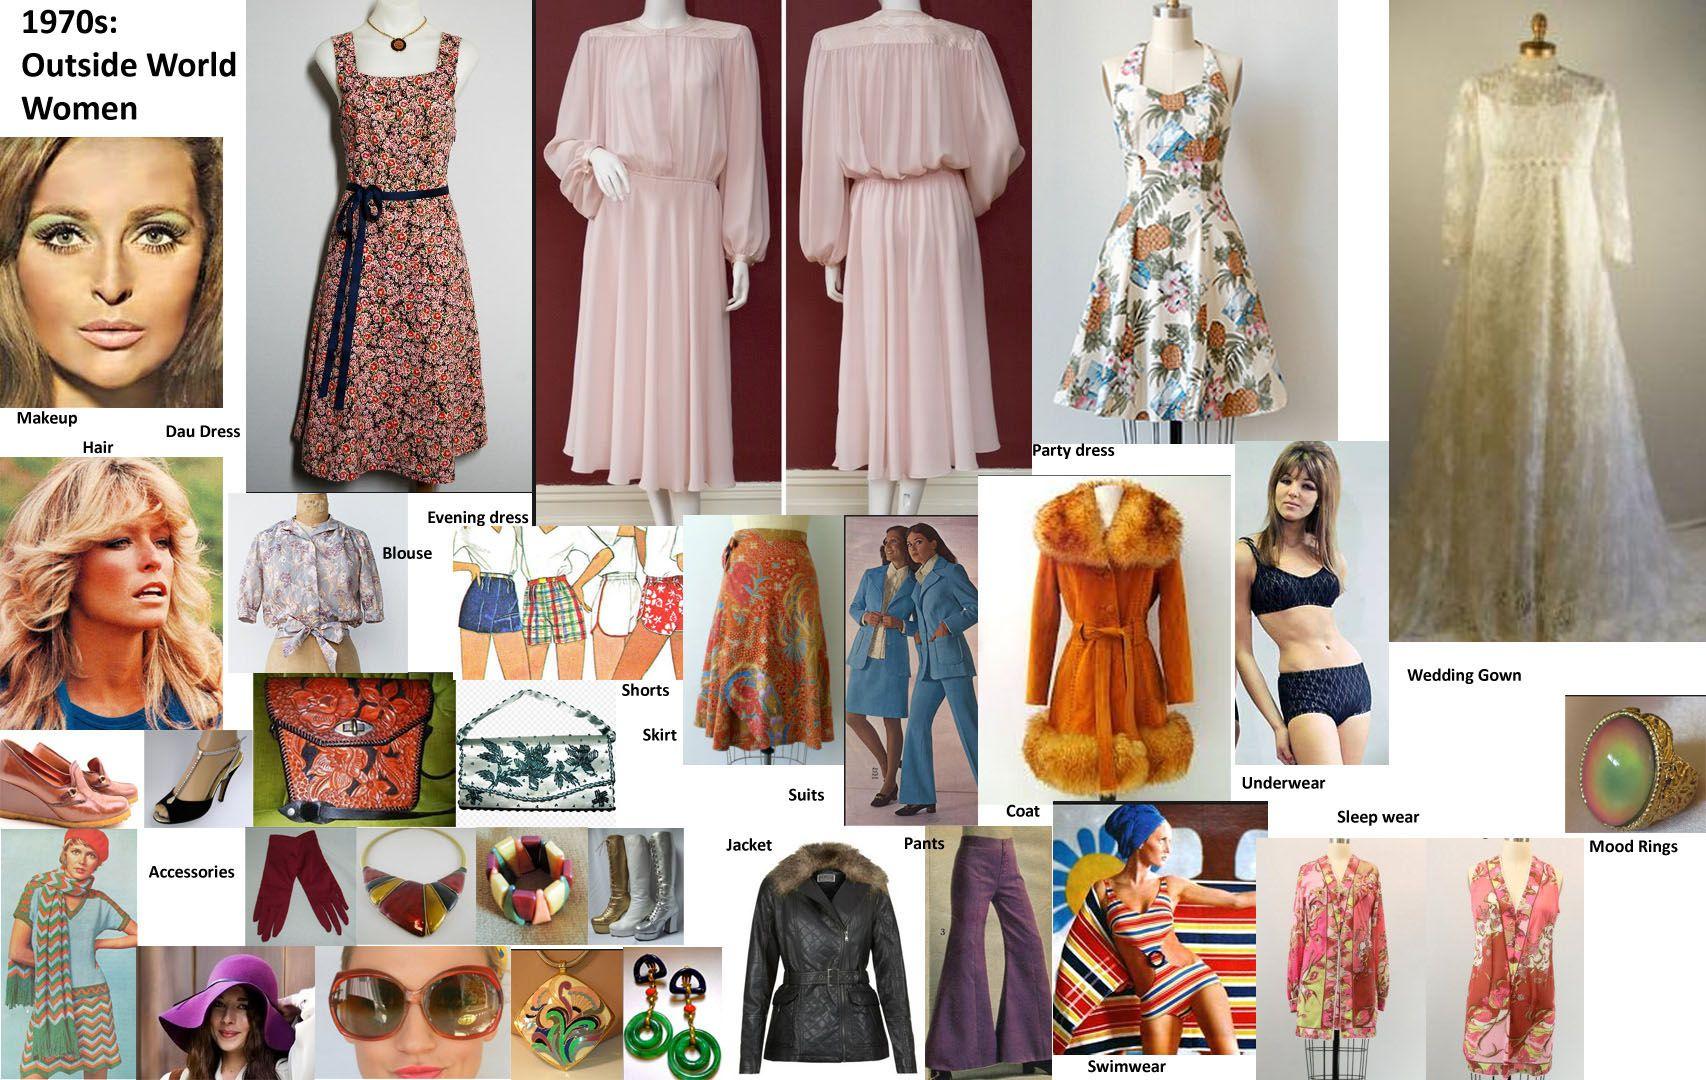 Outside world outside of arcadia fashion s womenus fashion